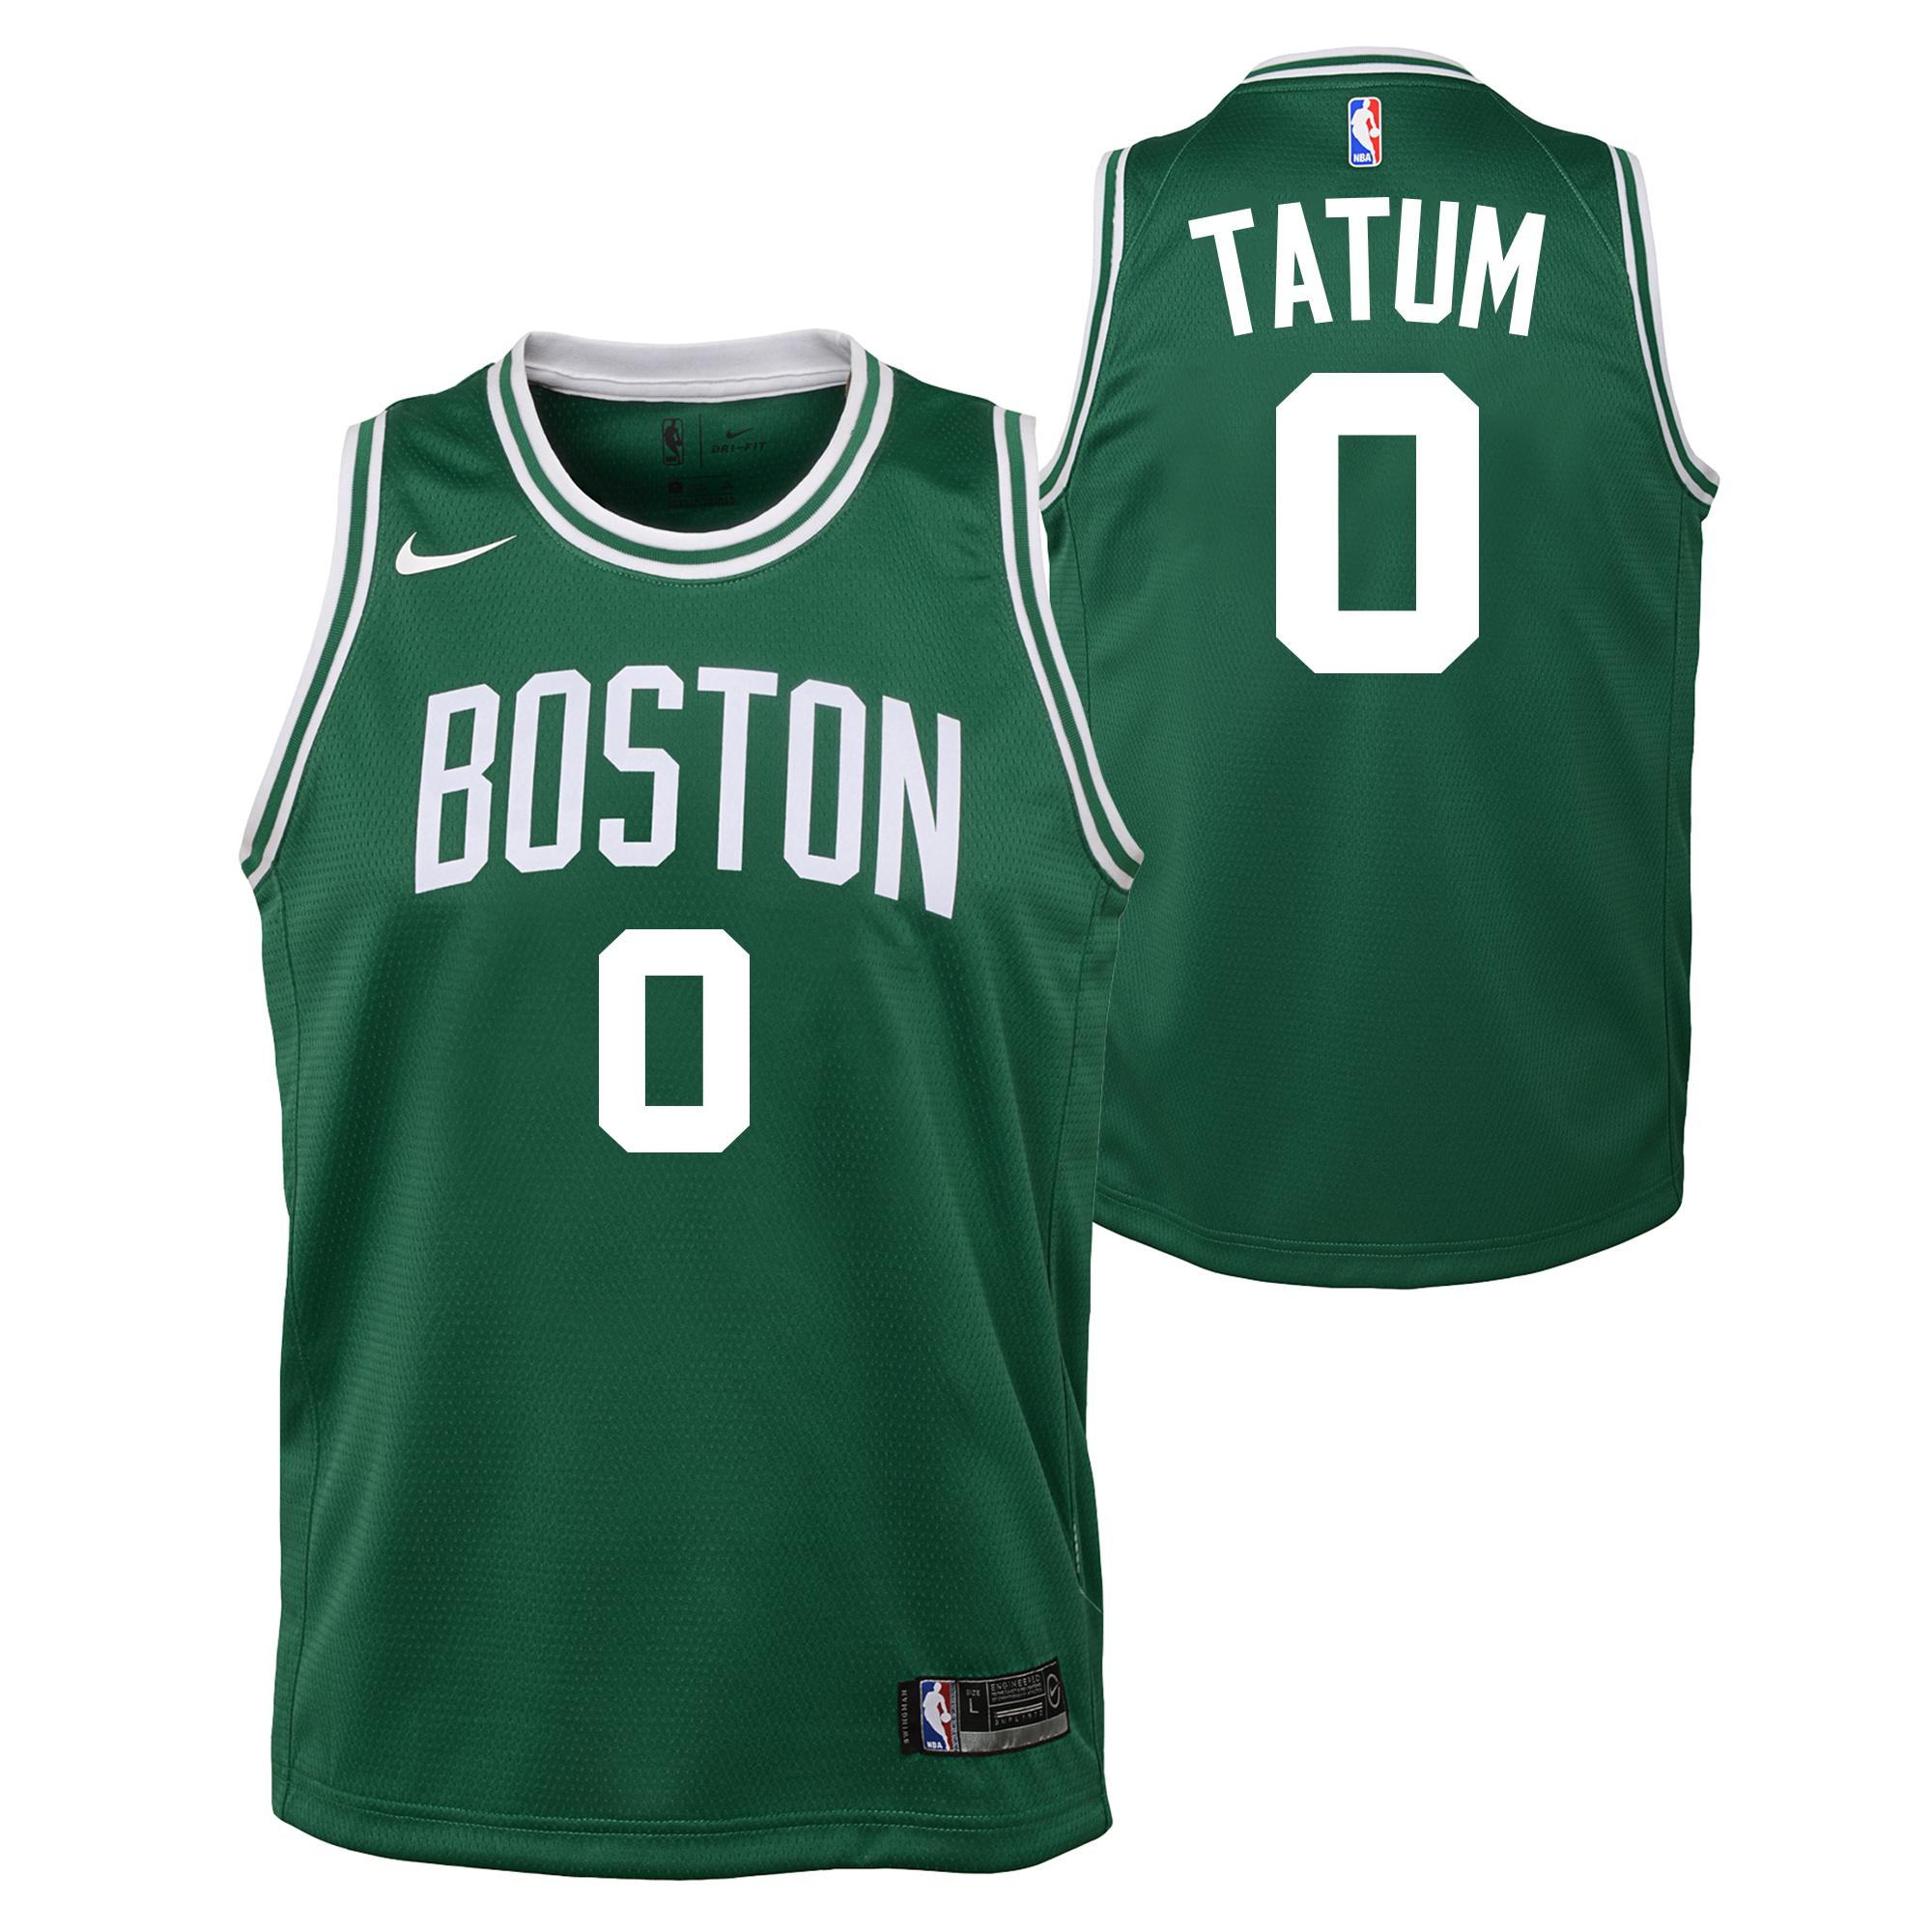 """Boston Celtics Nike Icon Swingman Jersey - Jayson Tatum - Youth"""